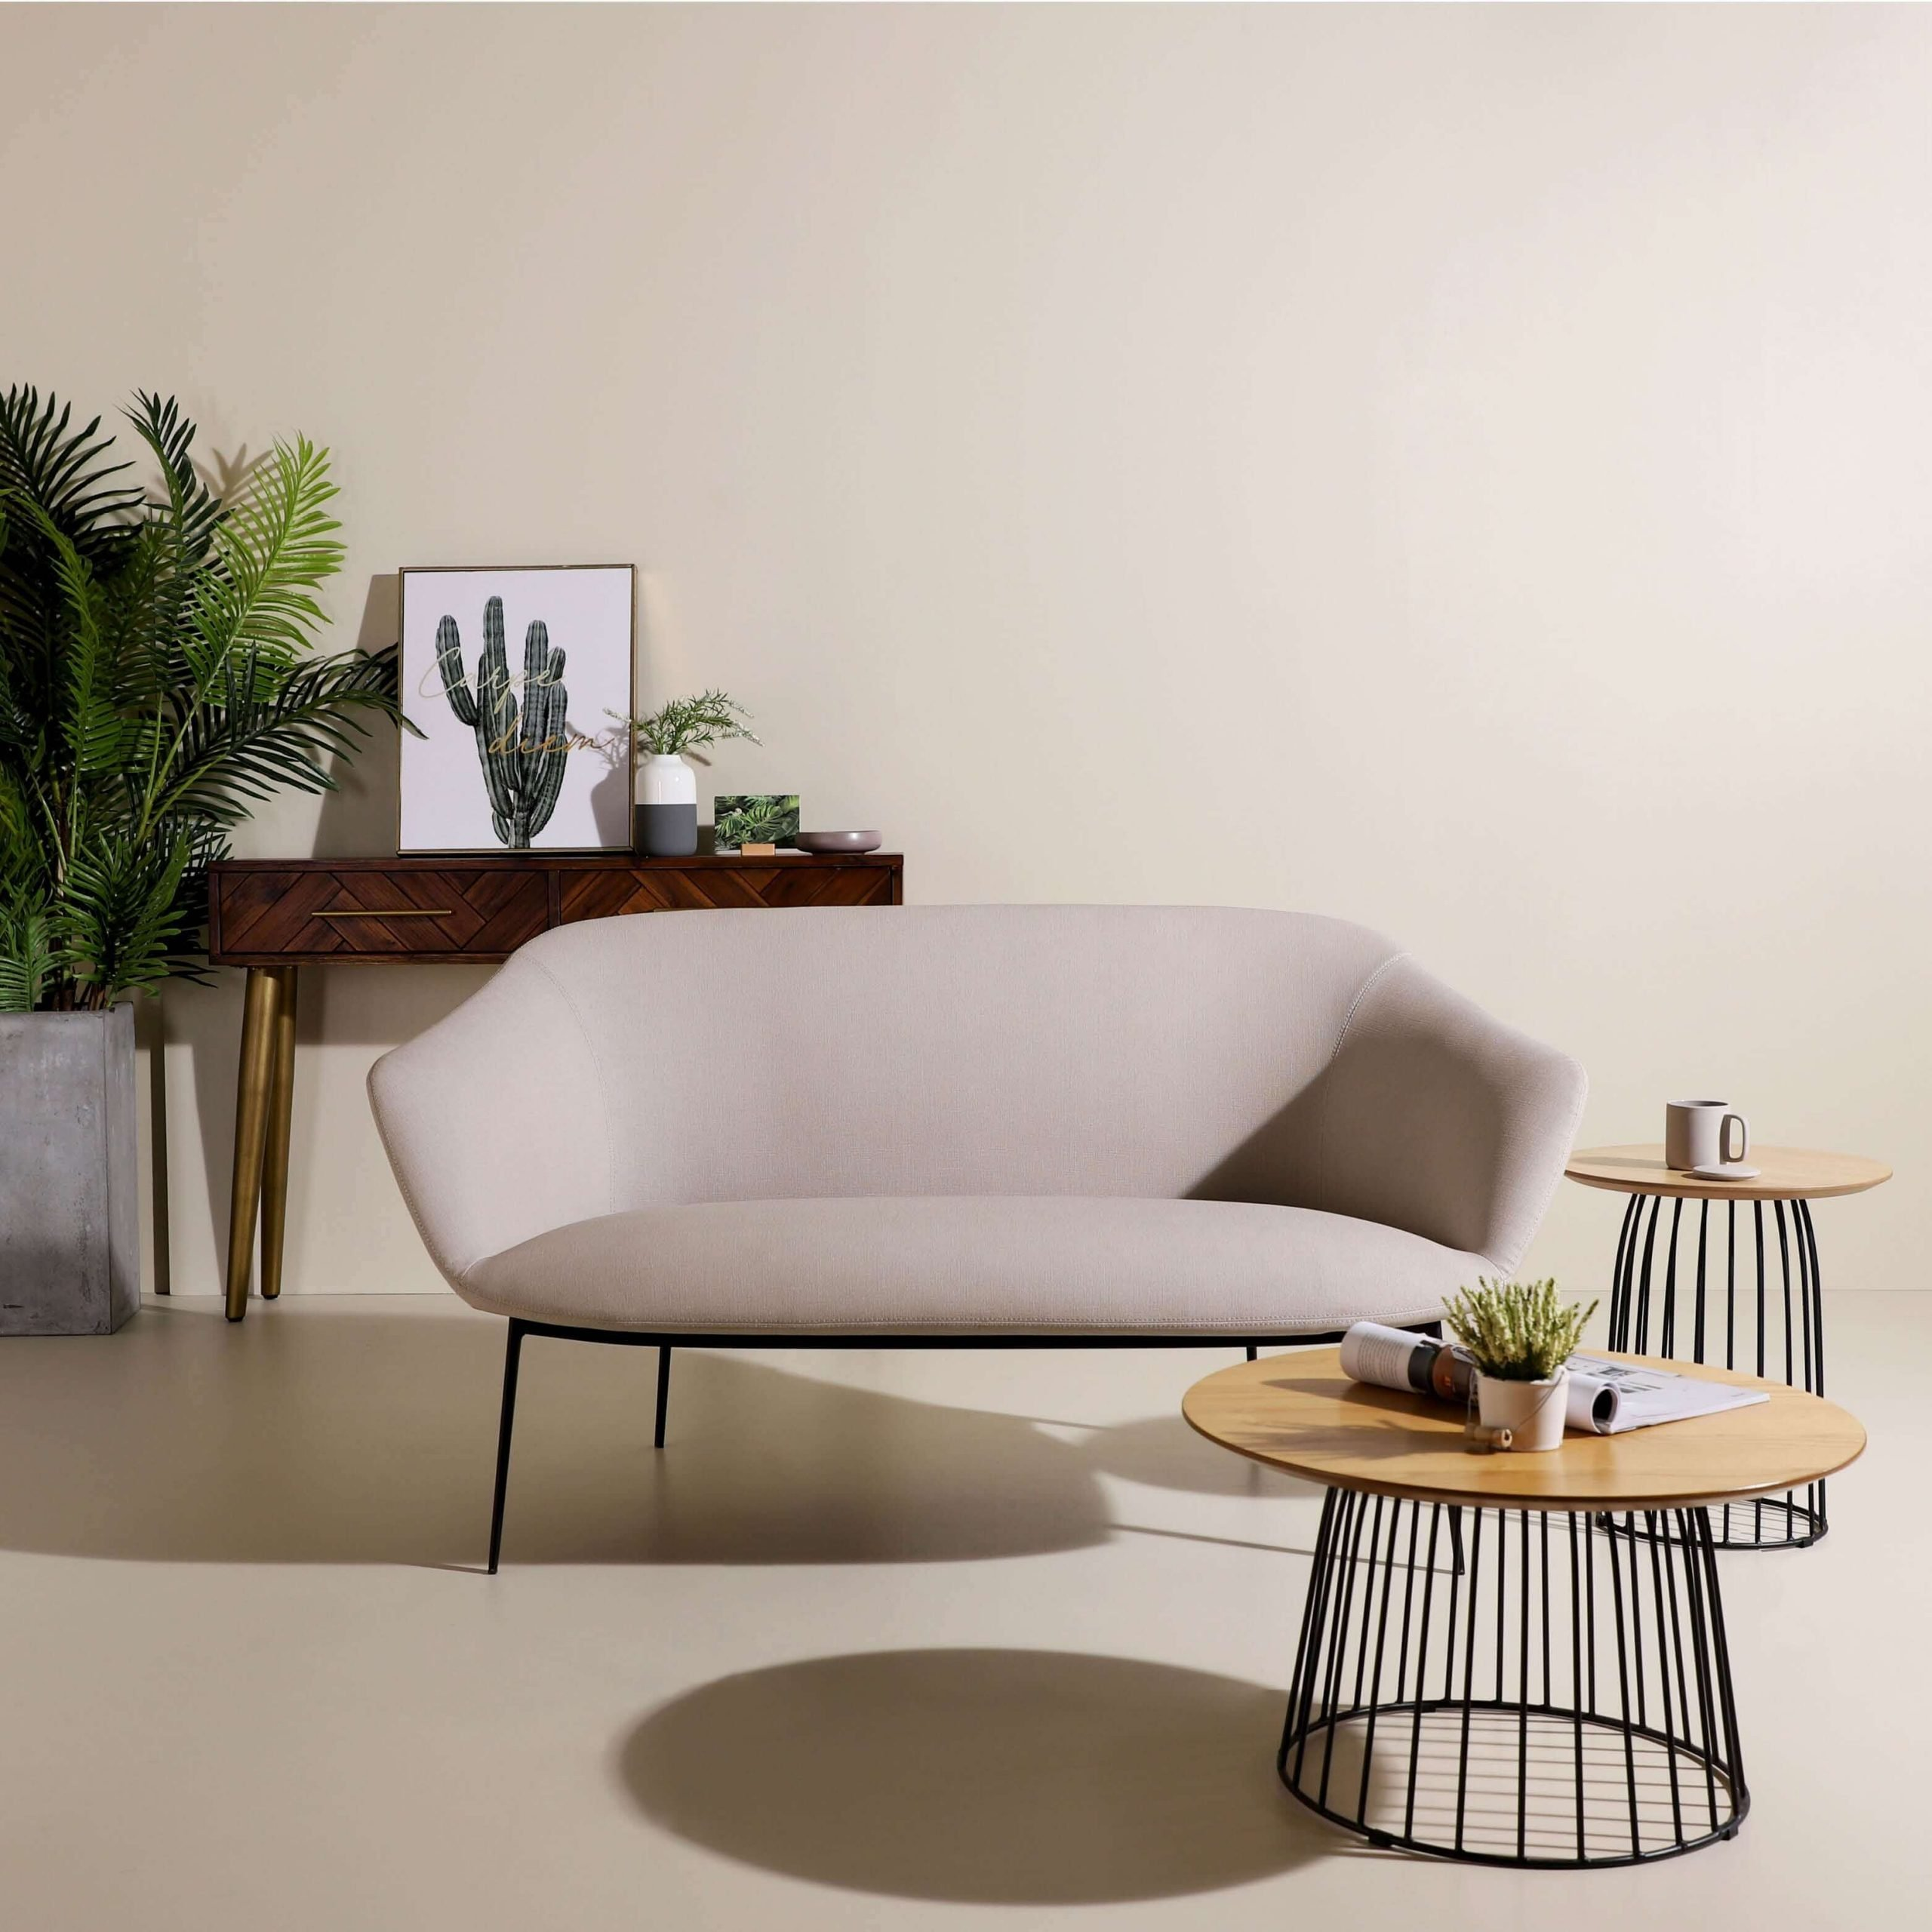 Living Room Mismatched Furniture Trends - Gillian 2 Seater Sofa - Comfort Furniture